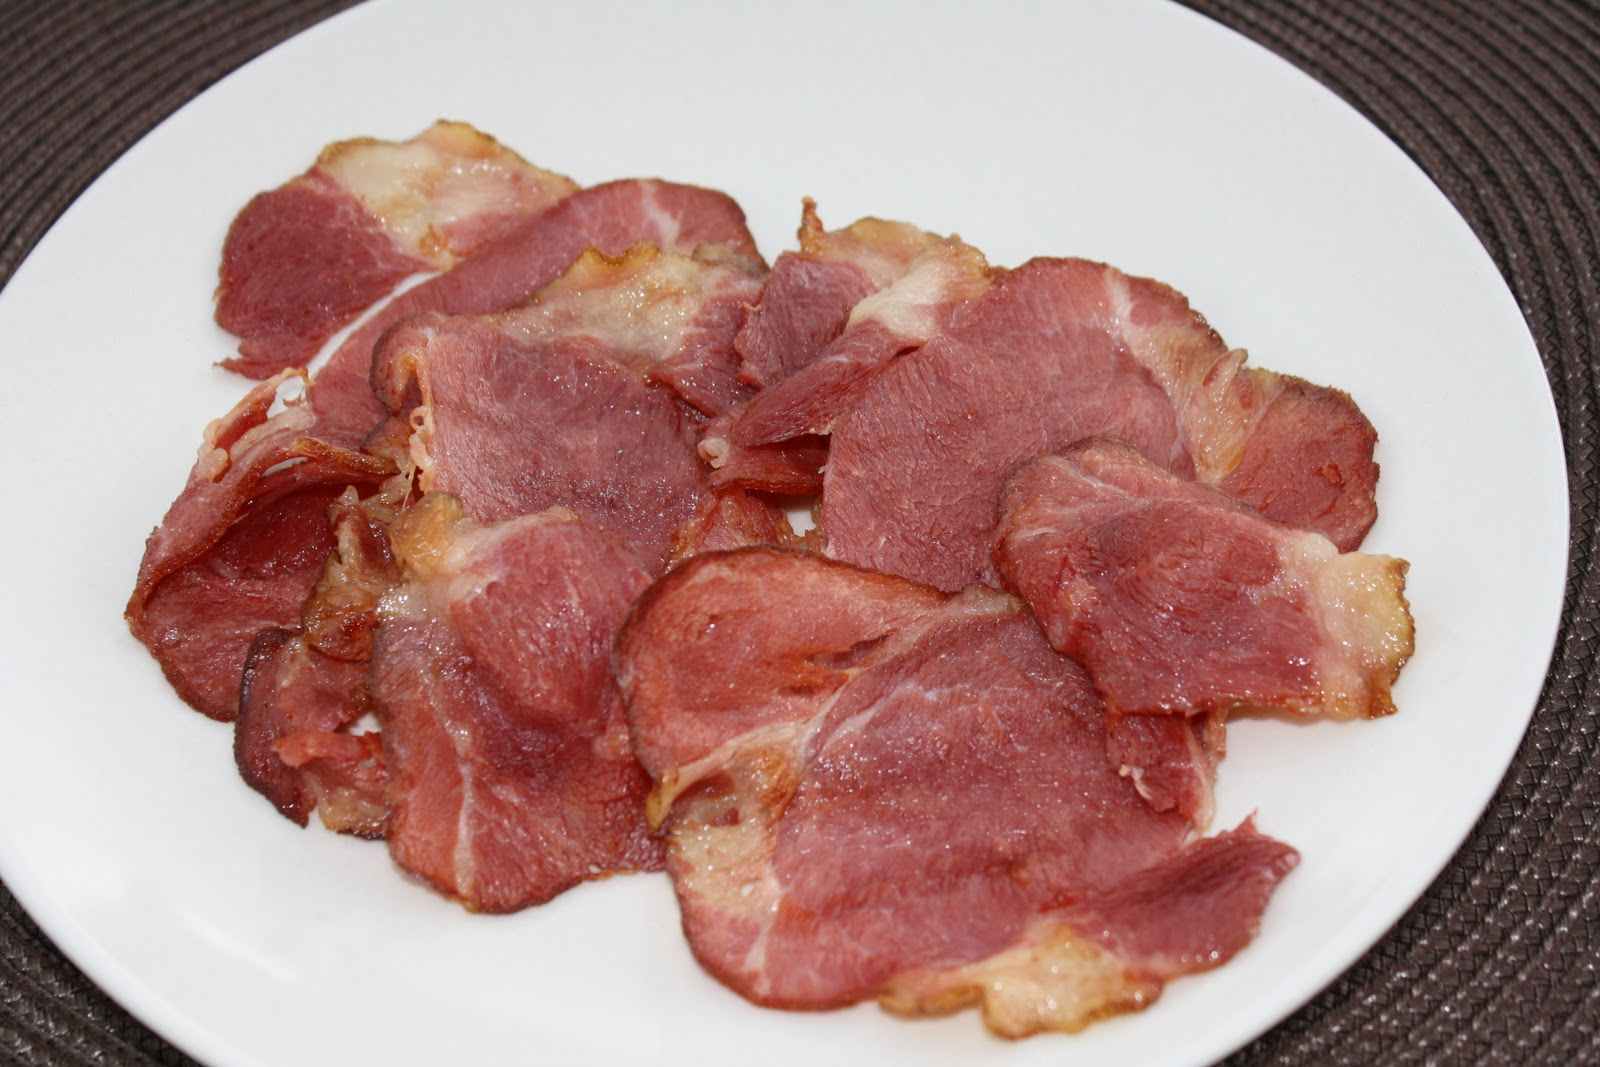 triple t s specialty cottage bacon rh tripletmeats blogspot com cottage bacon recipes river cottage australia bacon recipe